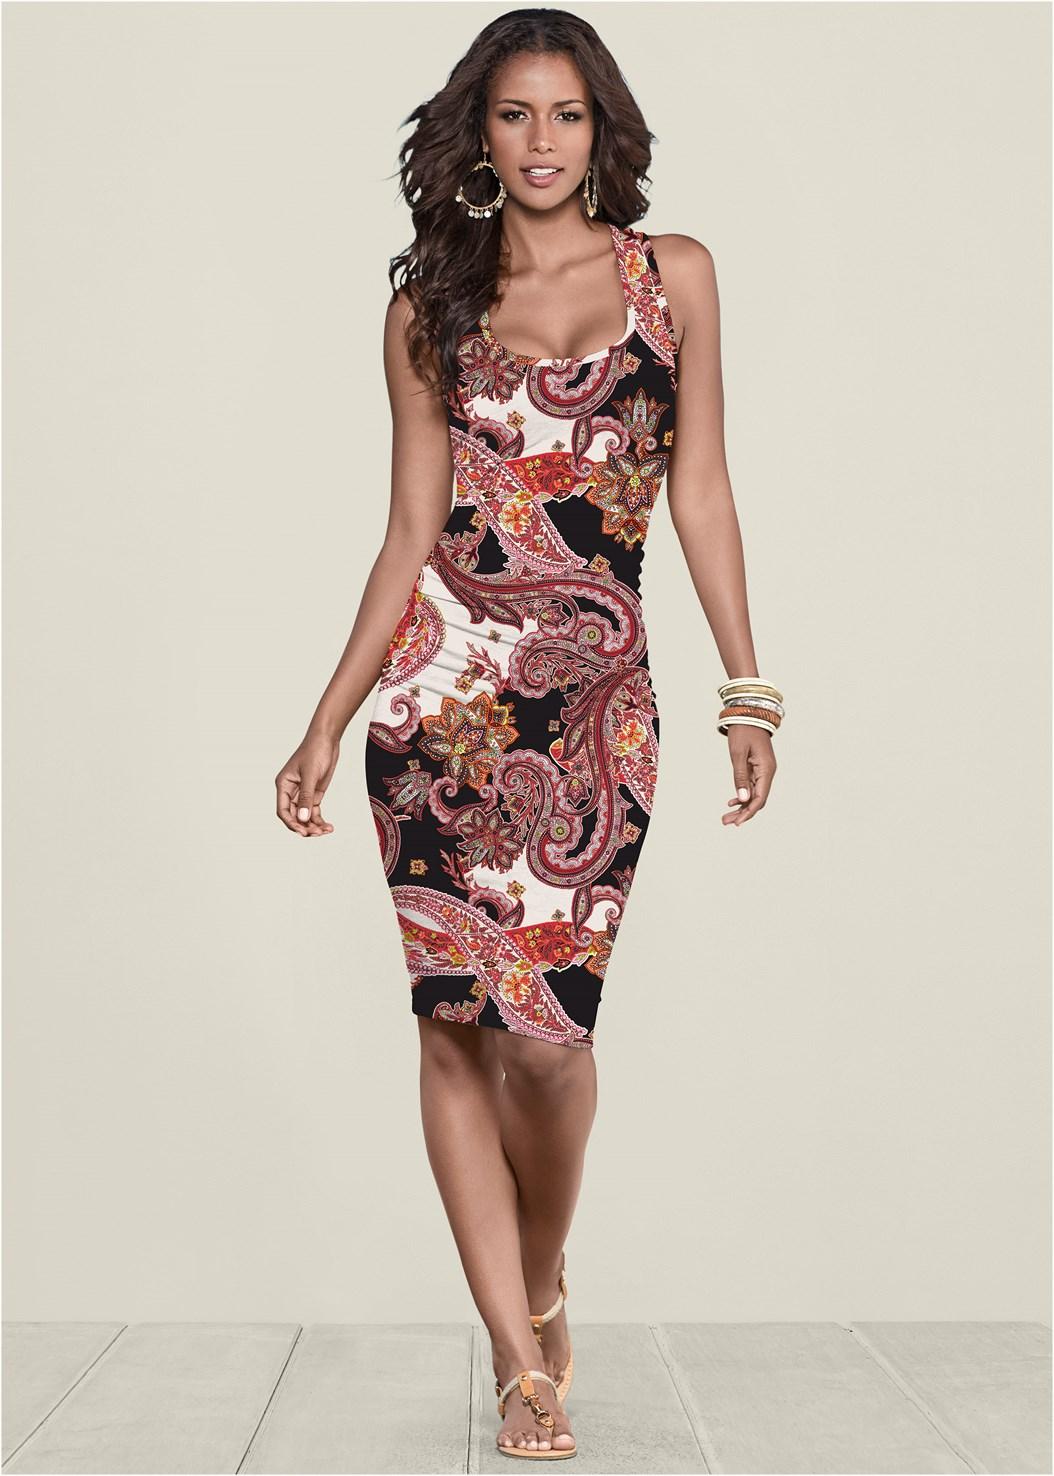 Ruched Print Tank Dress,Sleeveless Ruched Bodycon Midi Dress,Rhinestone Thong Sandal,Tassel Hoop Earrings,Hoop Earrings,Animal Print Bangle Set